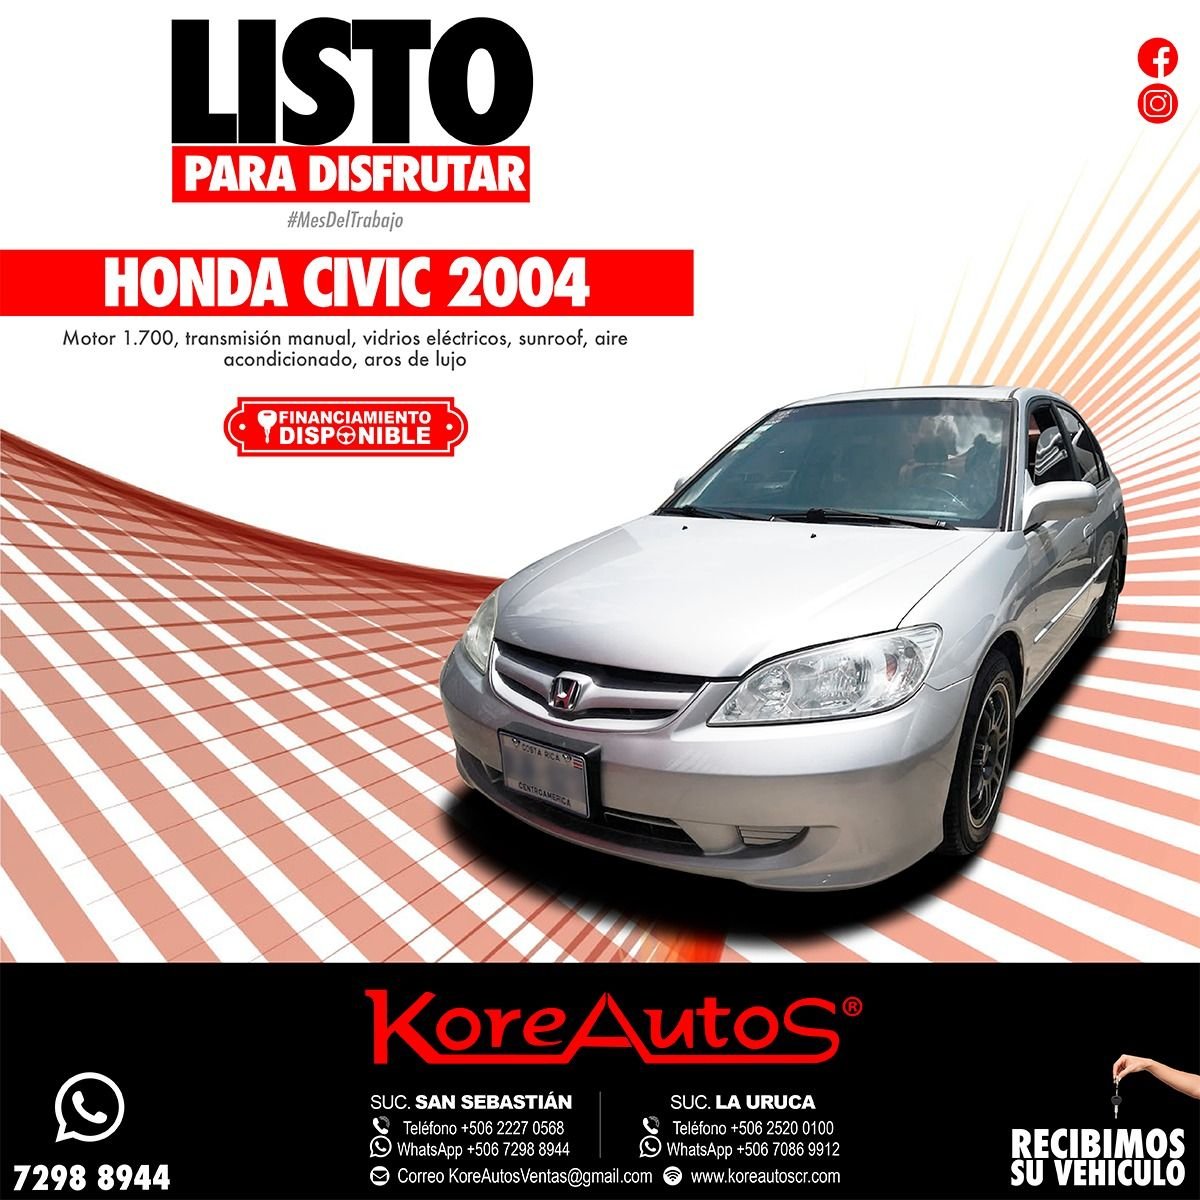 Honda Usados (With images) Honda civic 2004